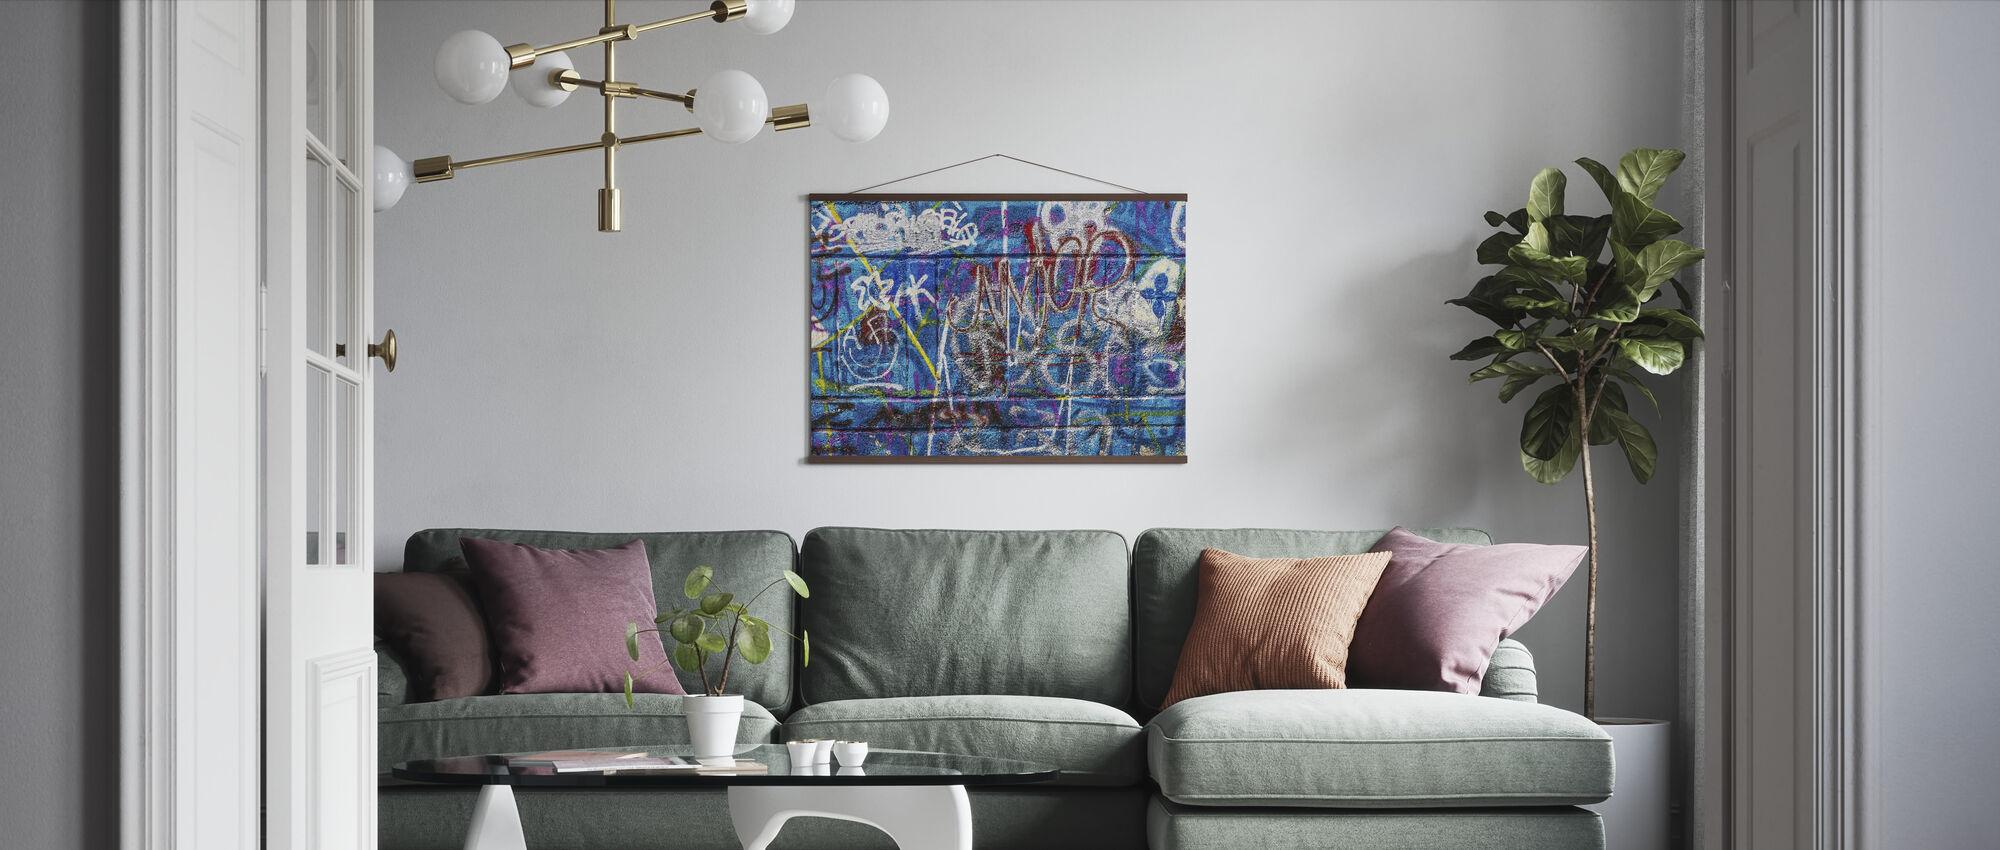 Wall Street Art - Poster - Living Room